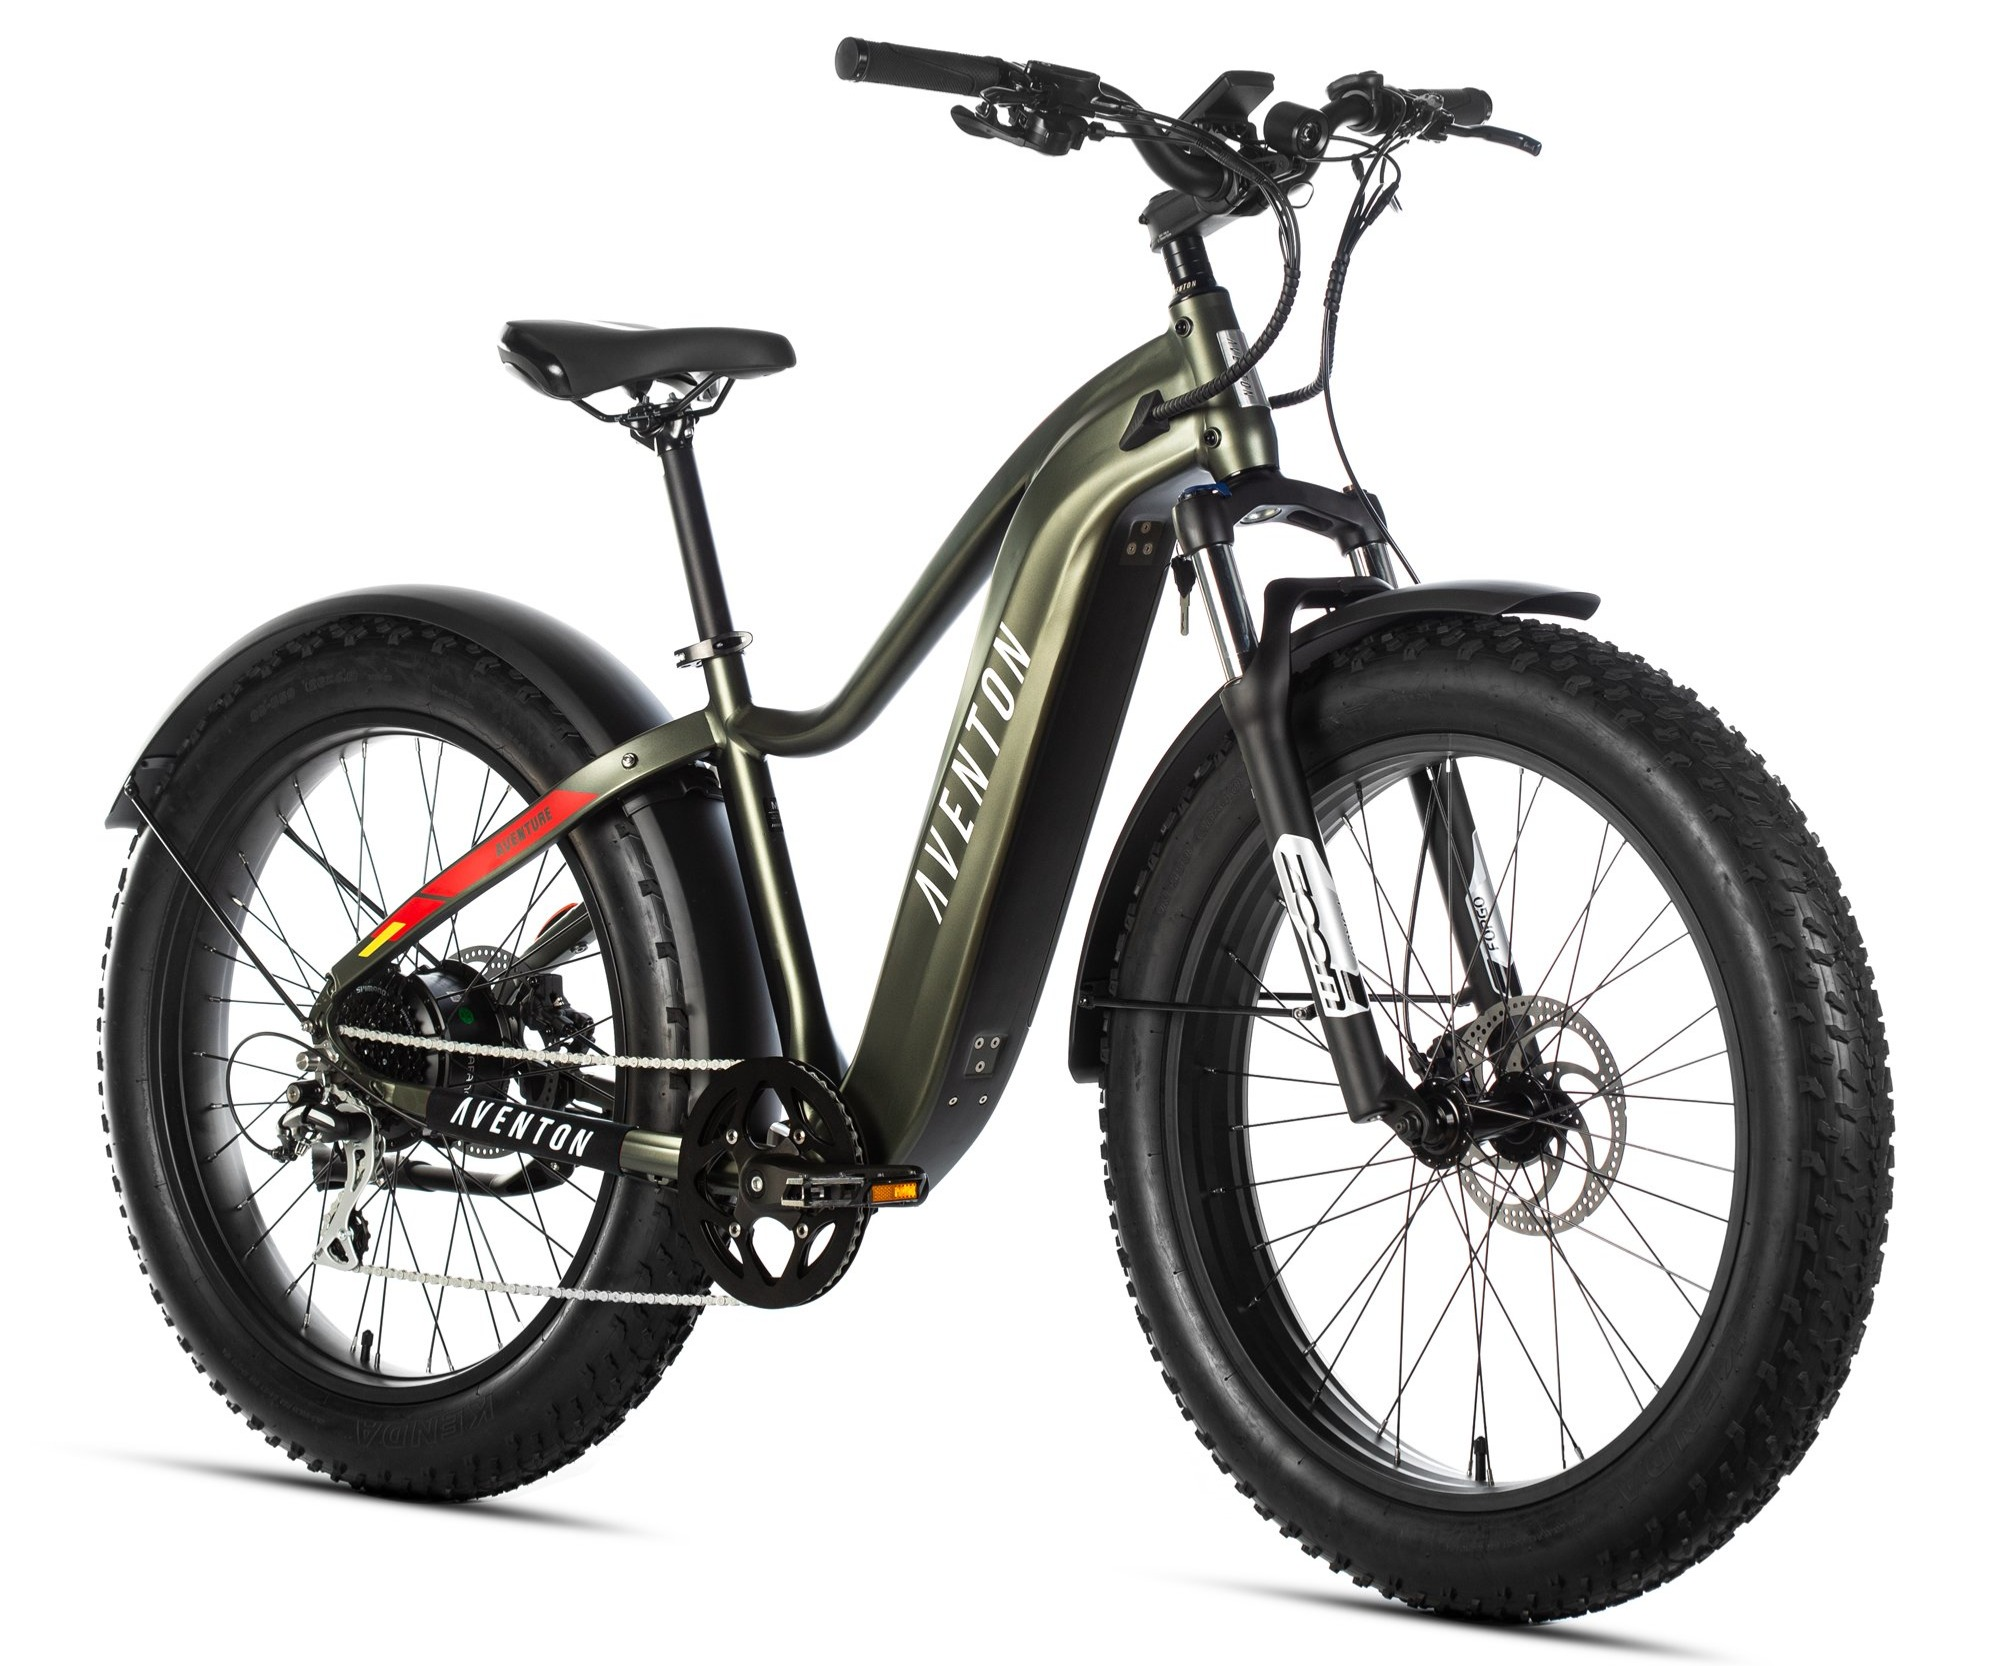 Aventon E-bikes, Adventure model